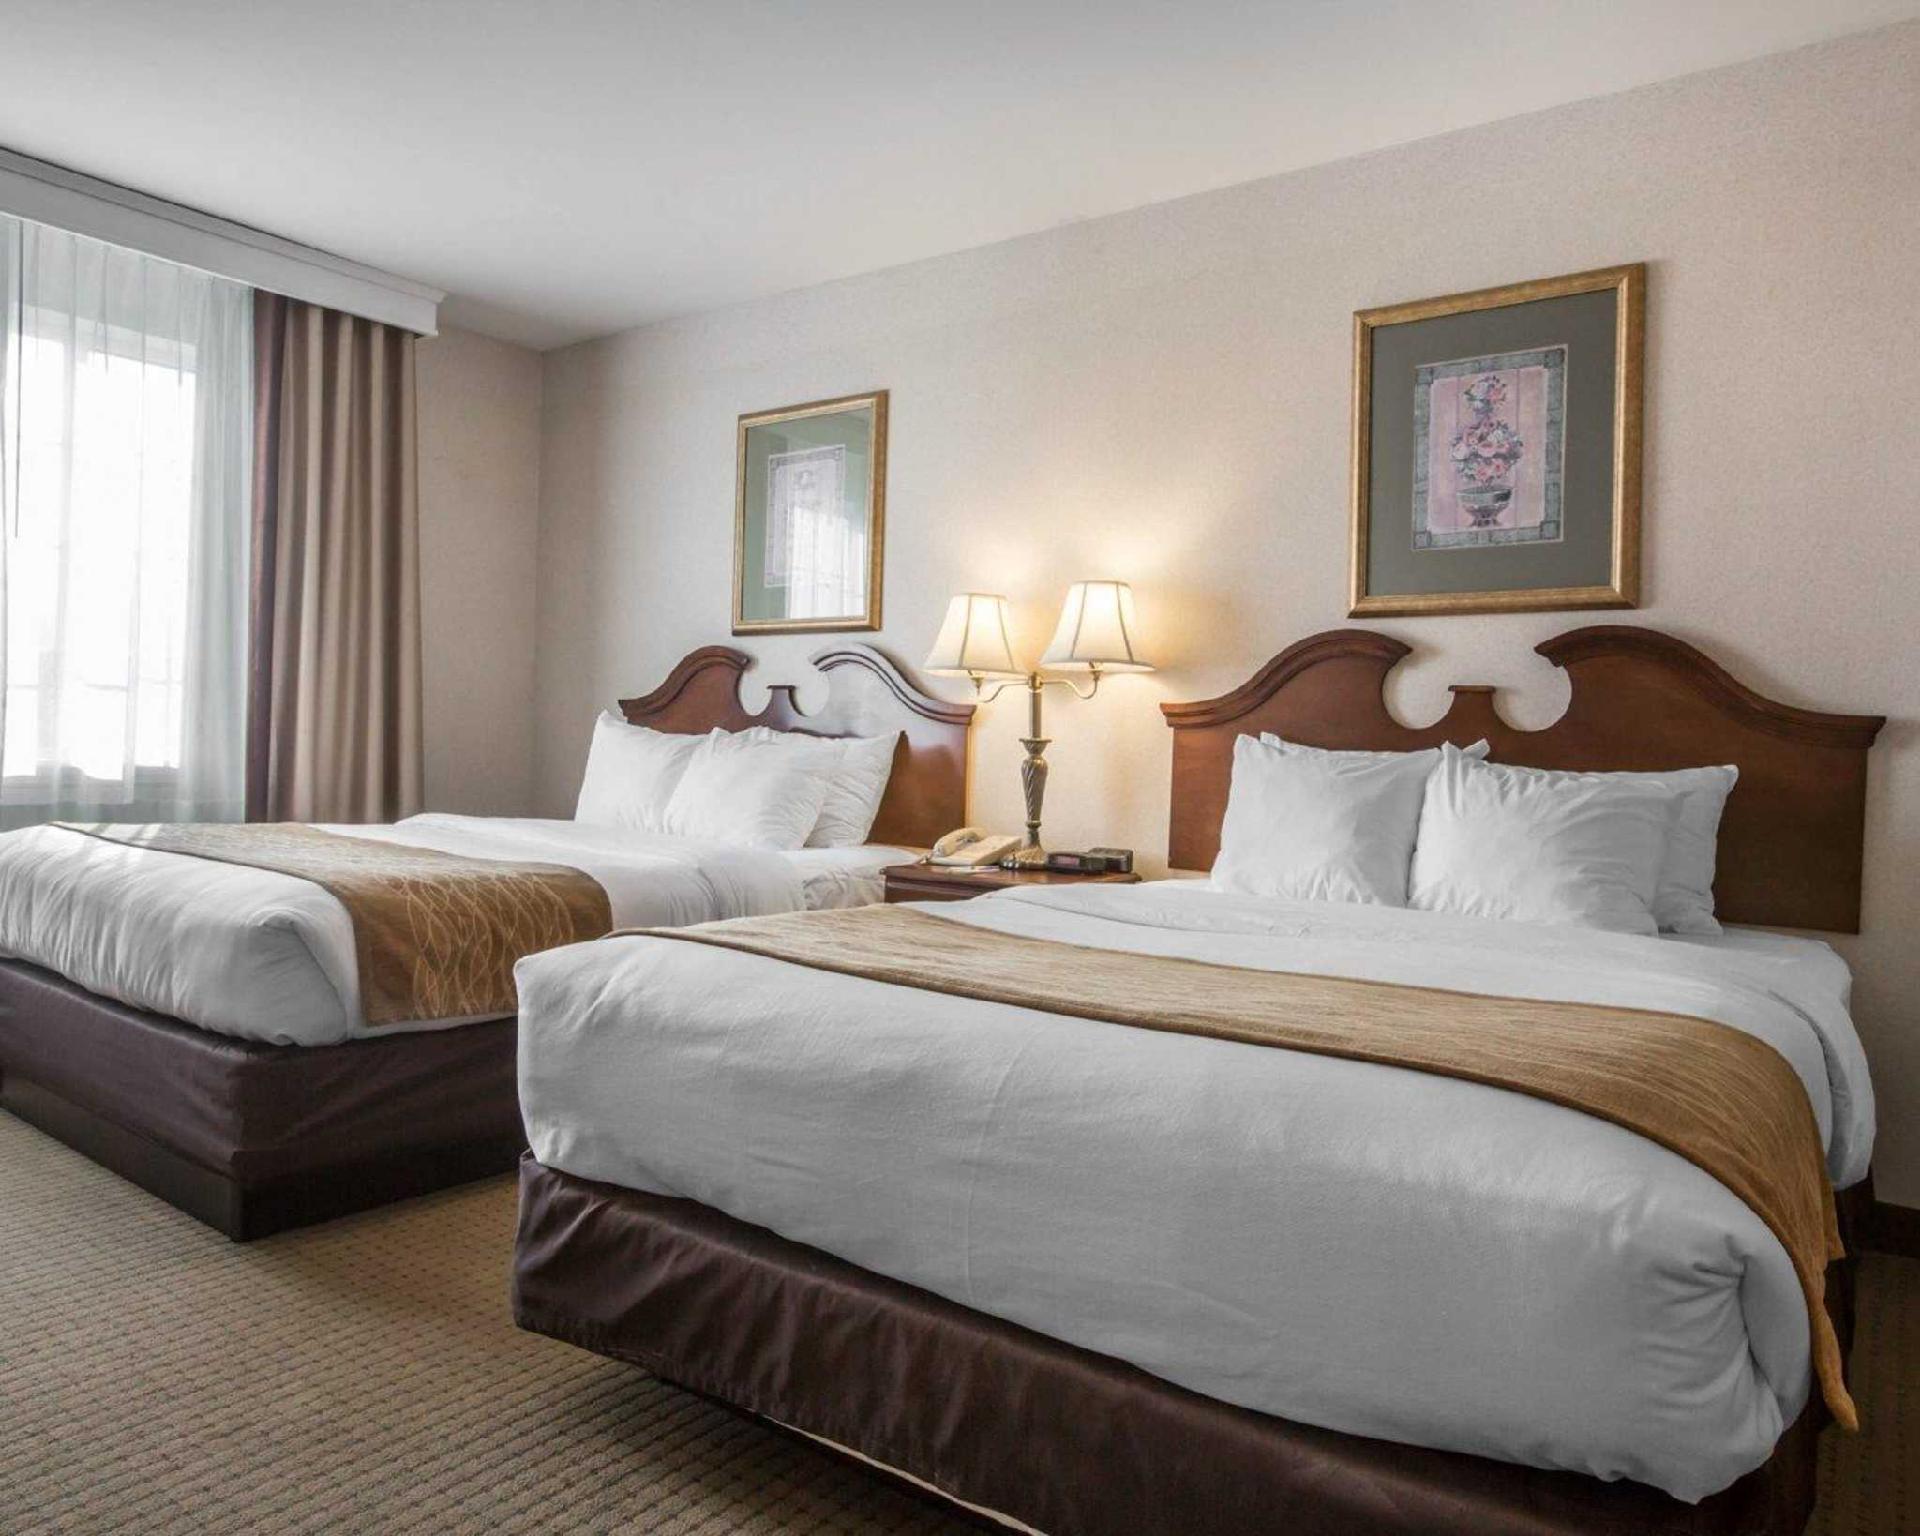 Comfort Inn & Suites East Greenbush - Albany, Rensselaer